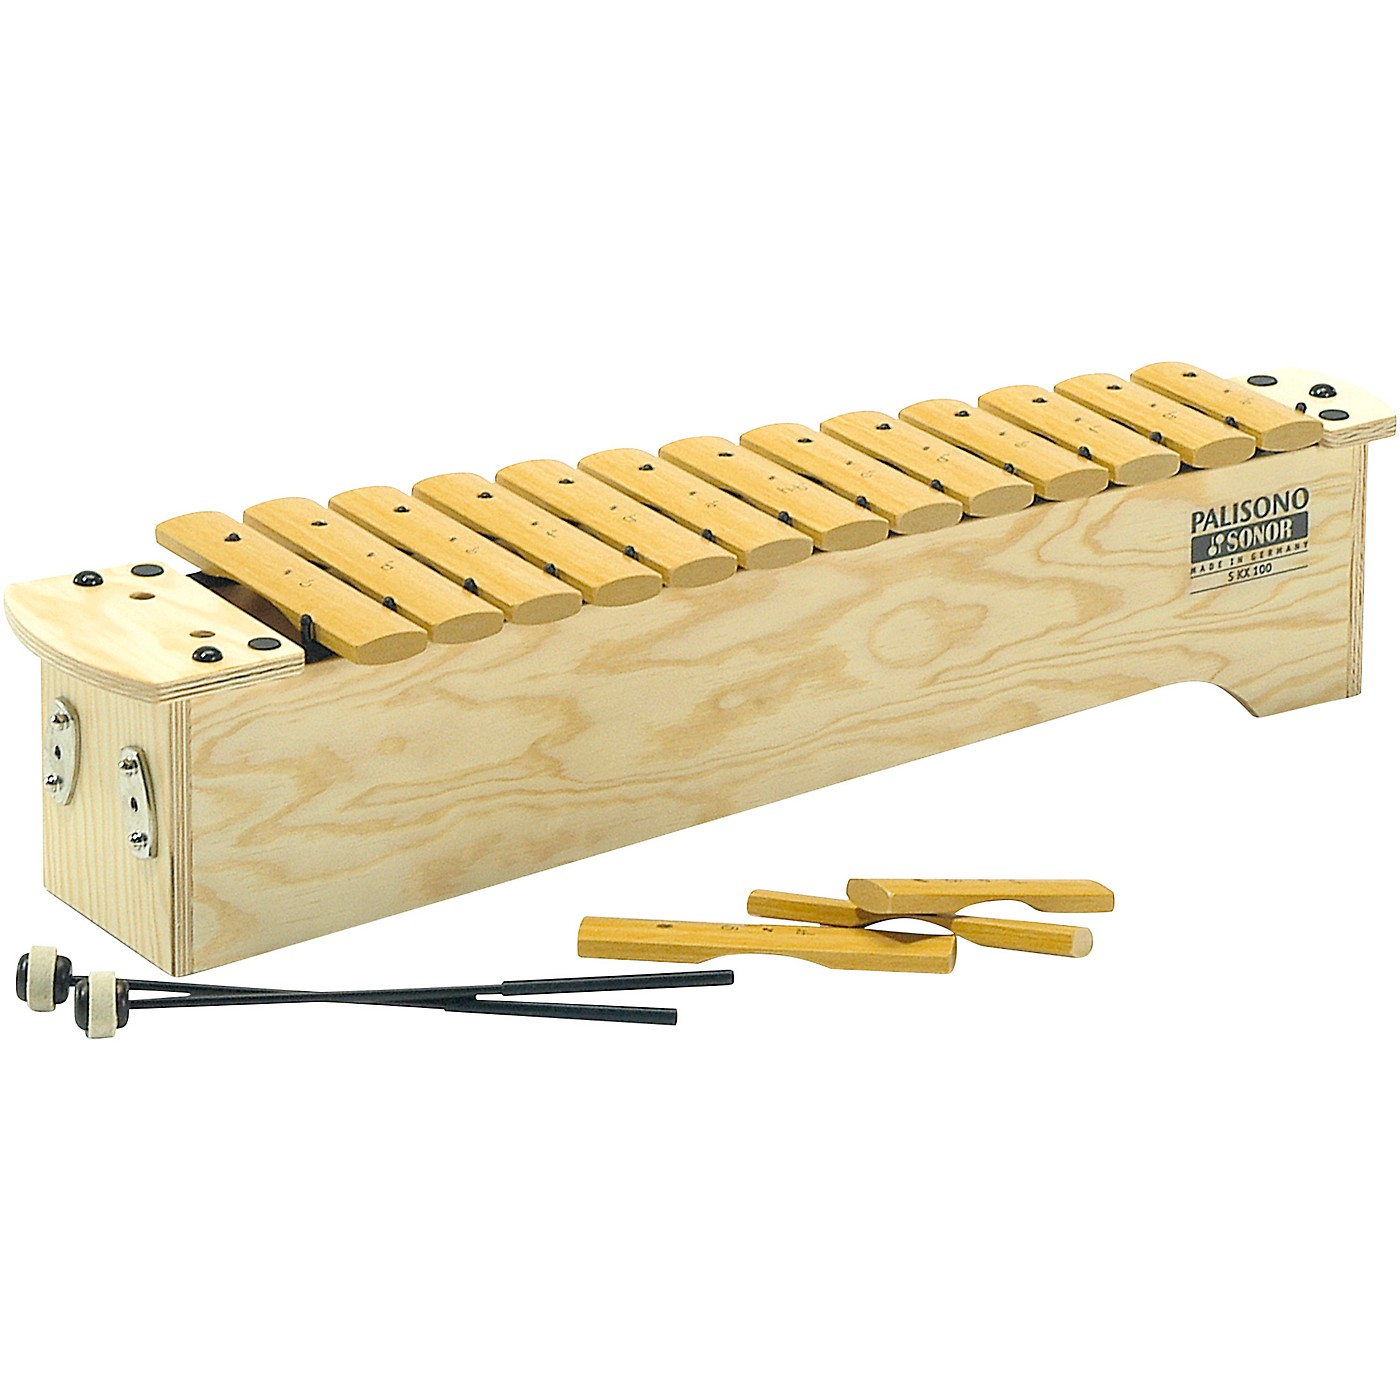 Sonor Orff Palisono Diatonic Soprano Xylophone thumbnail